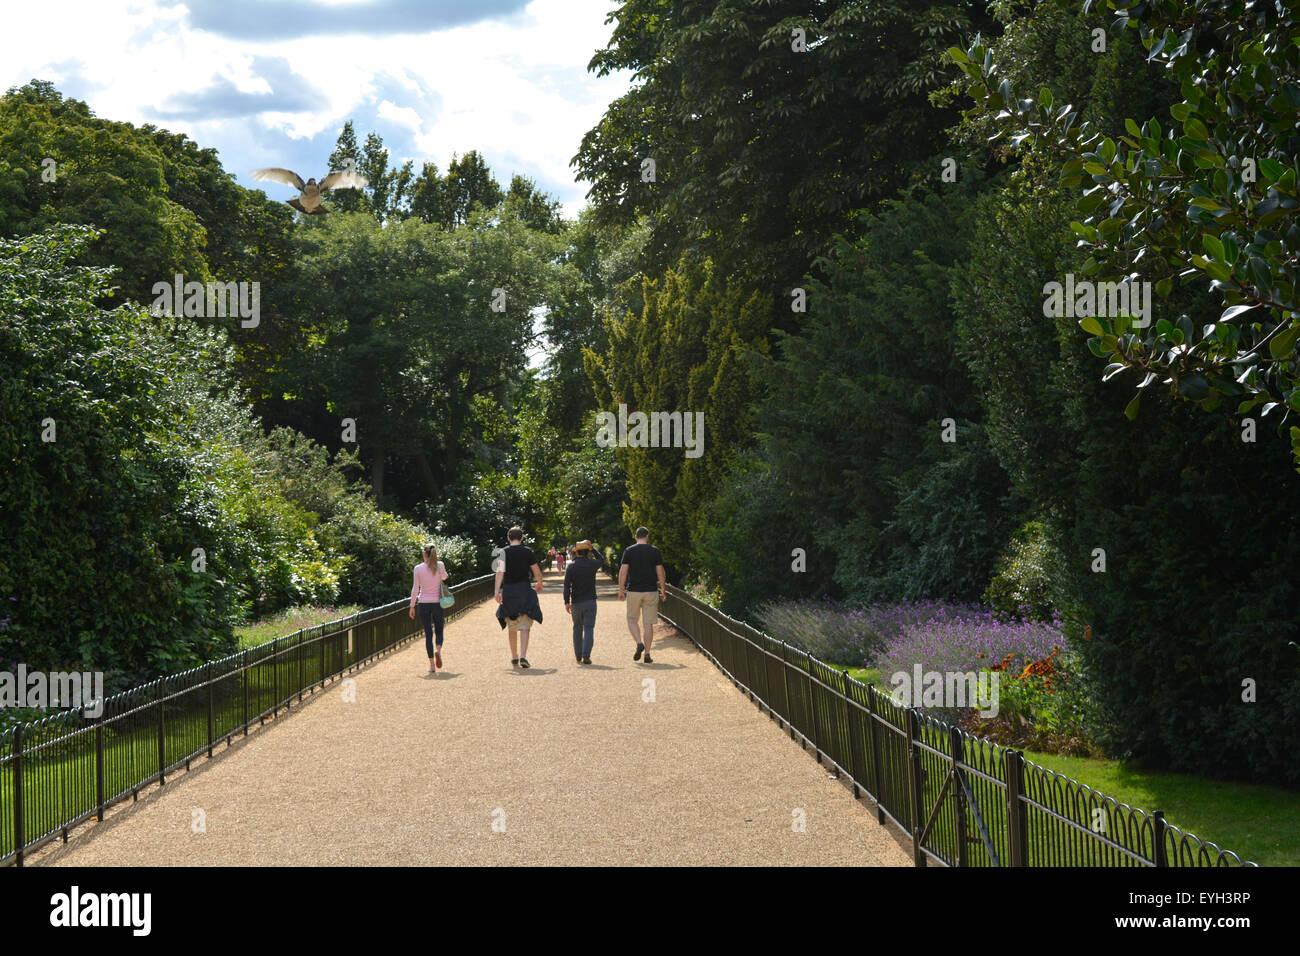 Garden Walk London: Flower Gardens Walking Stock Photos & Flower Gardens Walking Stock Images